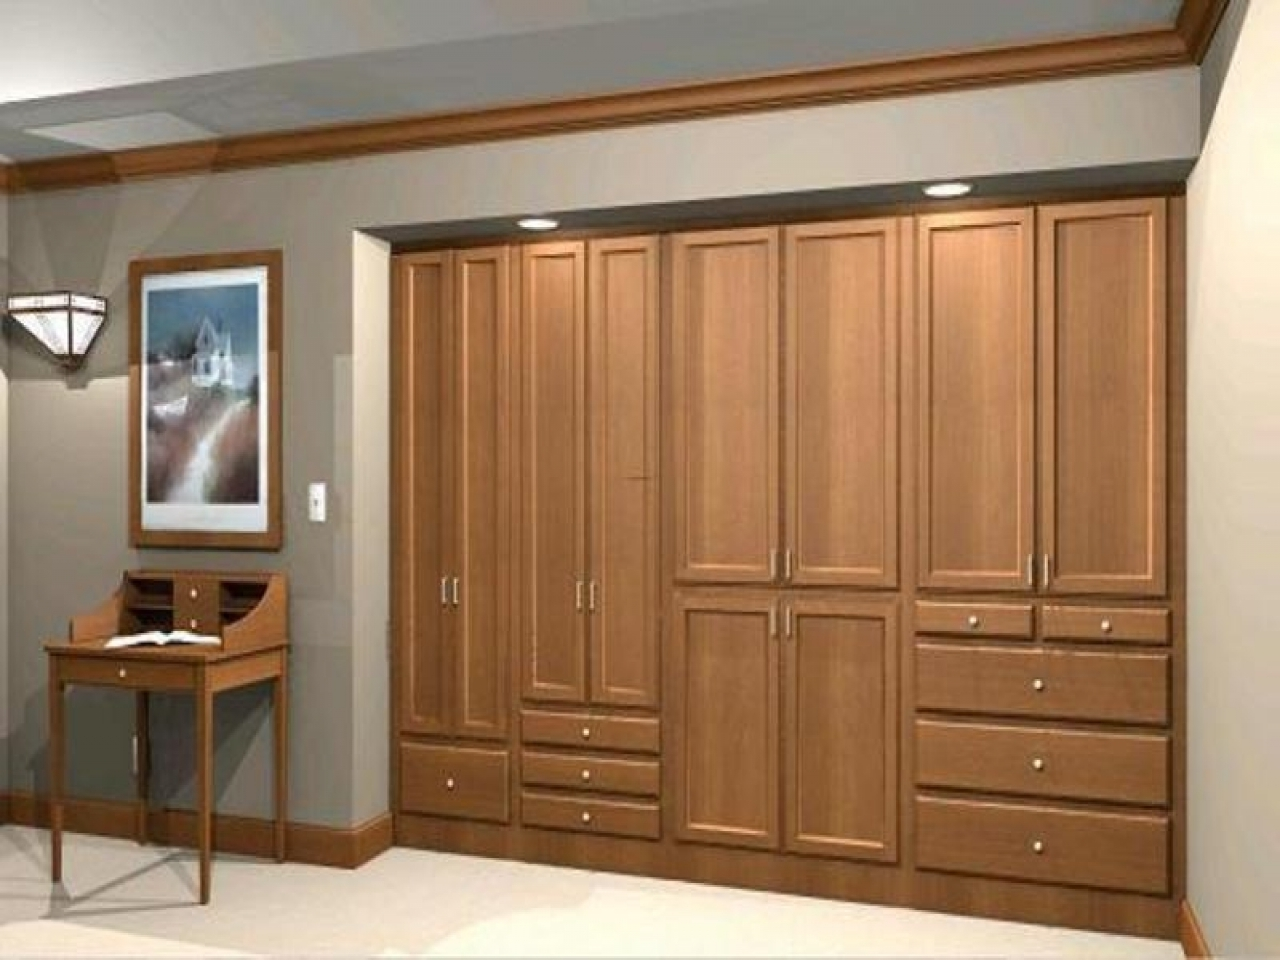 Recent Wardrobe Design : Wardrobe Wall Closet Design To Build Wardrobes For Wall Wardrobes (View 10 of 15)